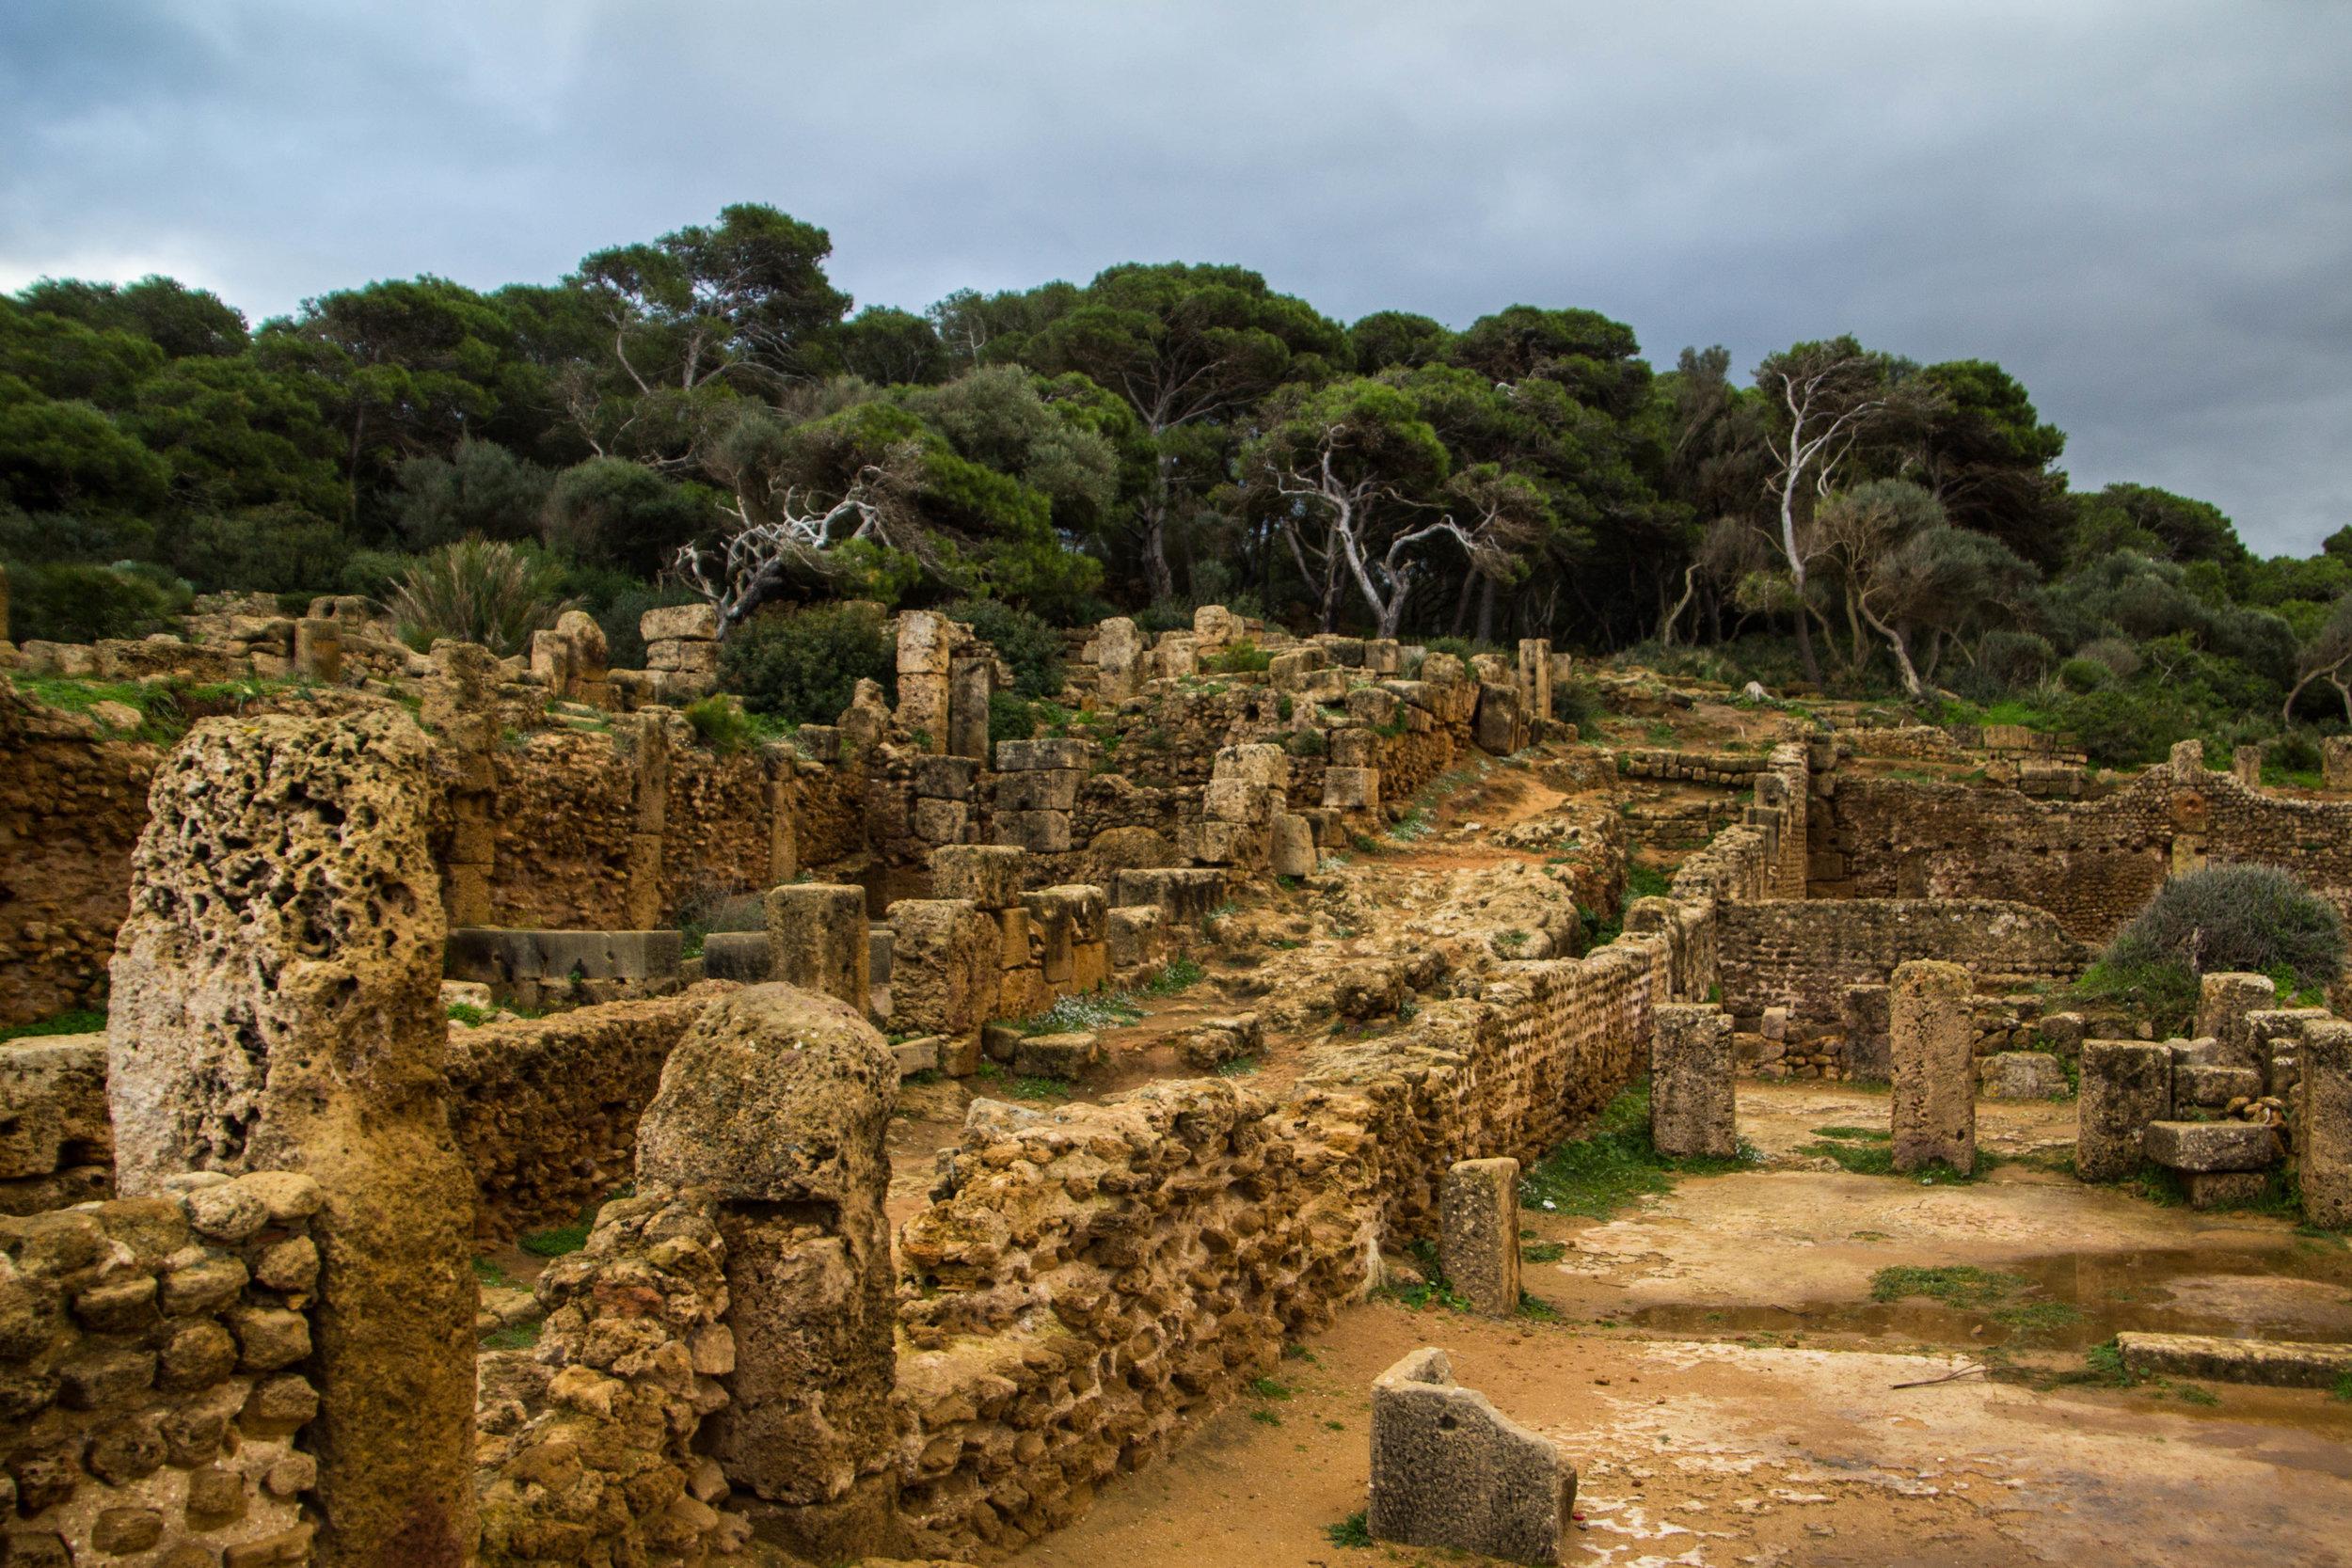 tipiza-roman-ruins-algeria-16.jpg